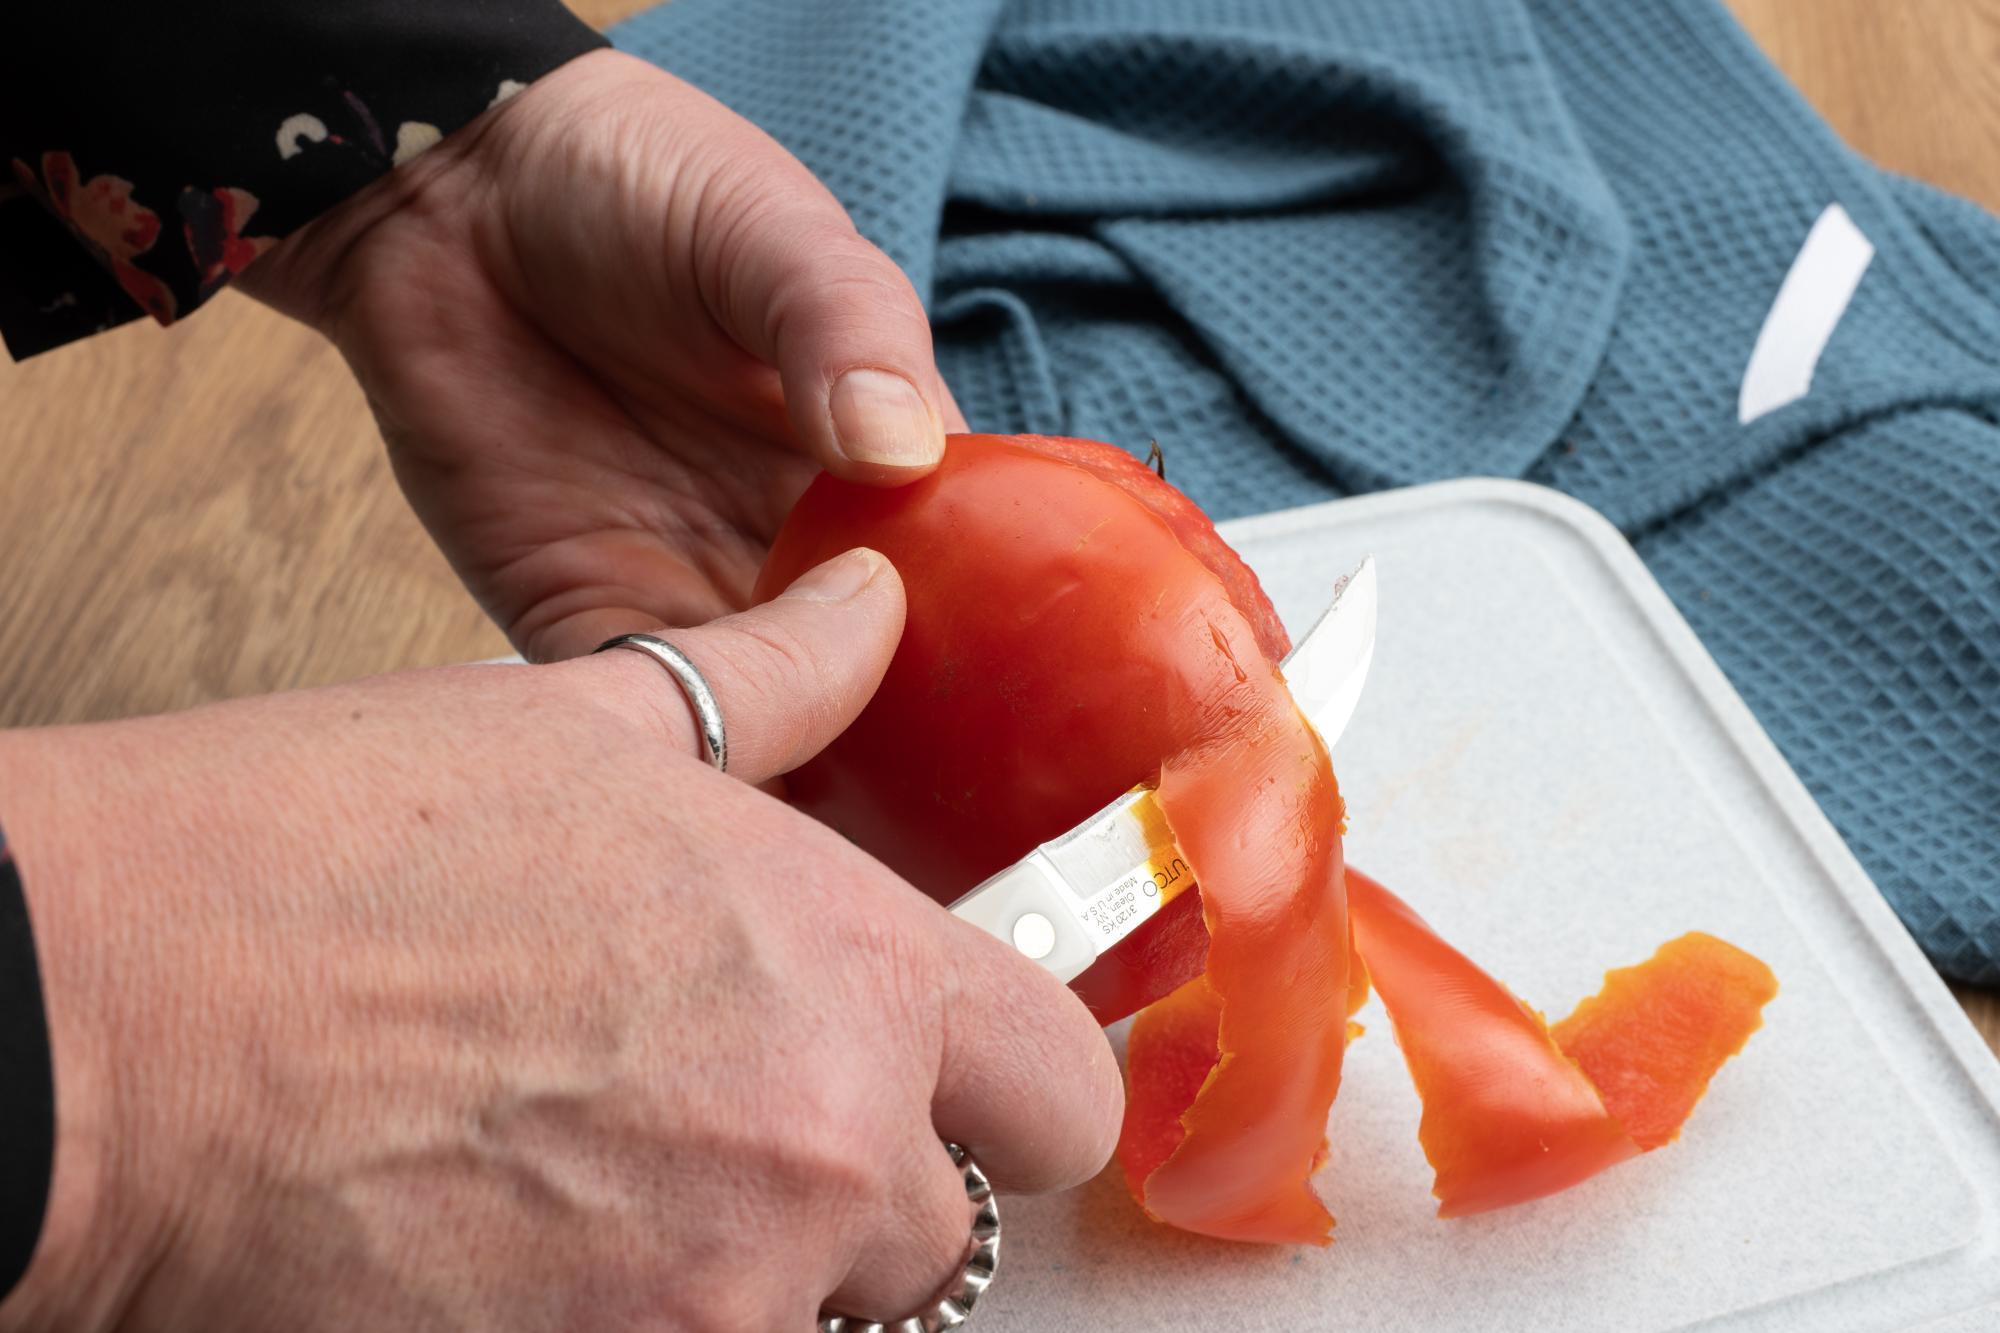 Continuing to peel the tomato.